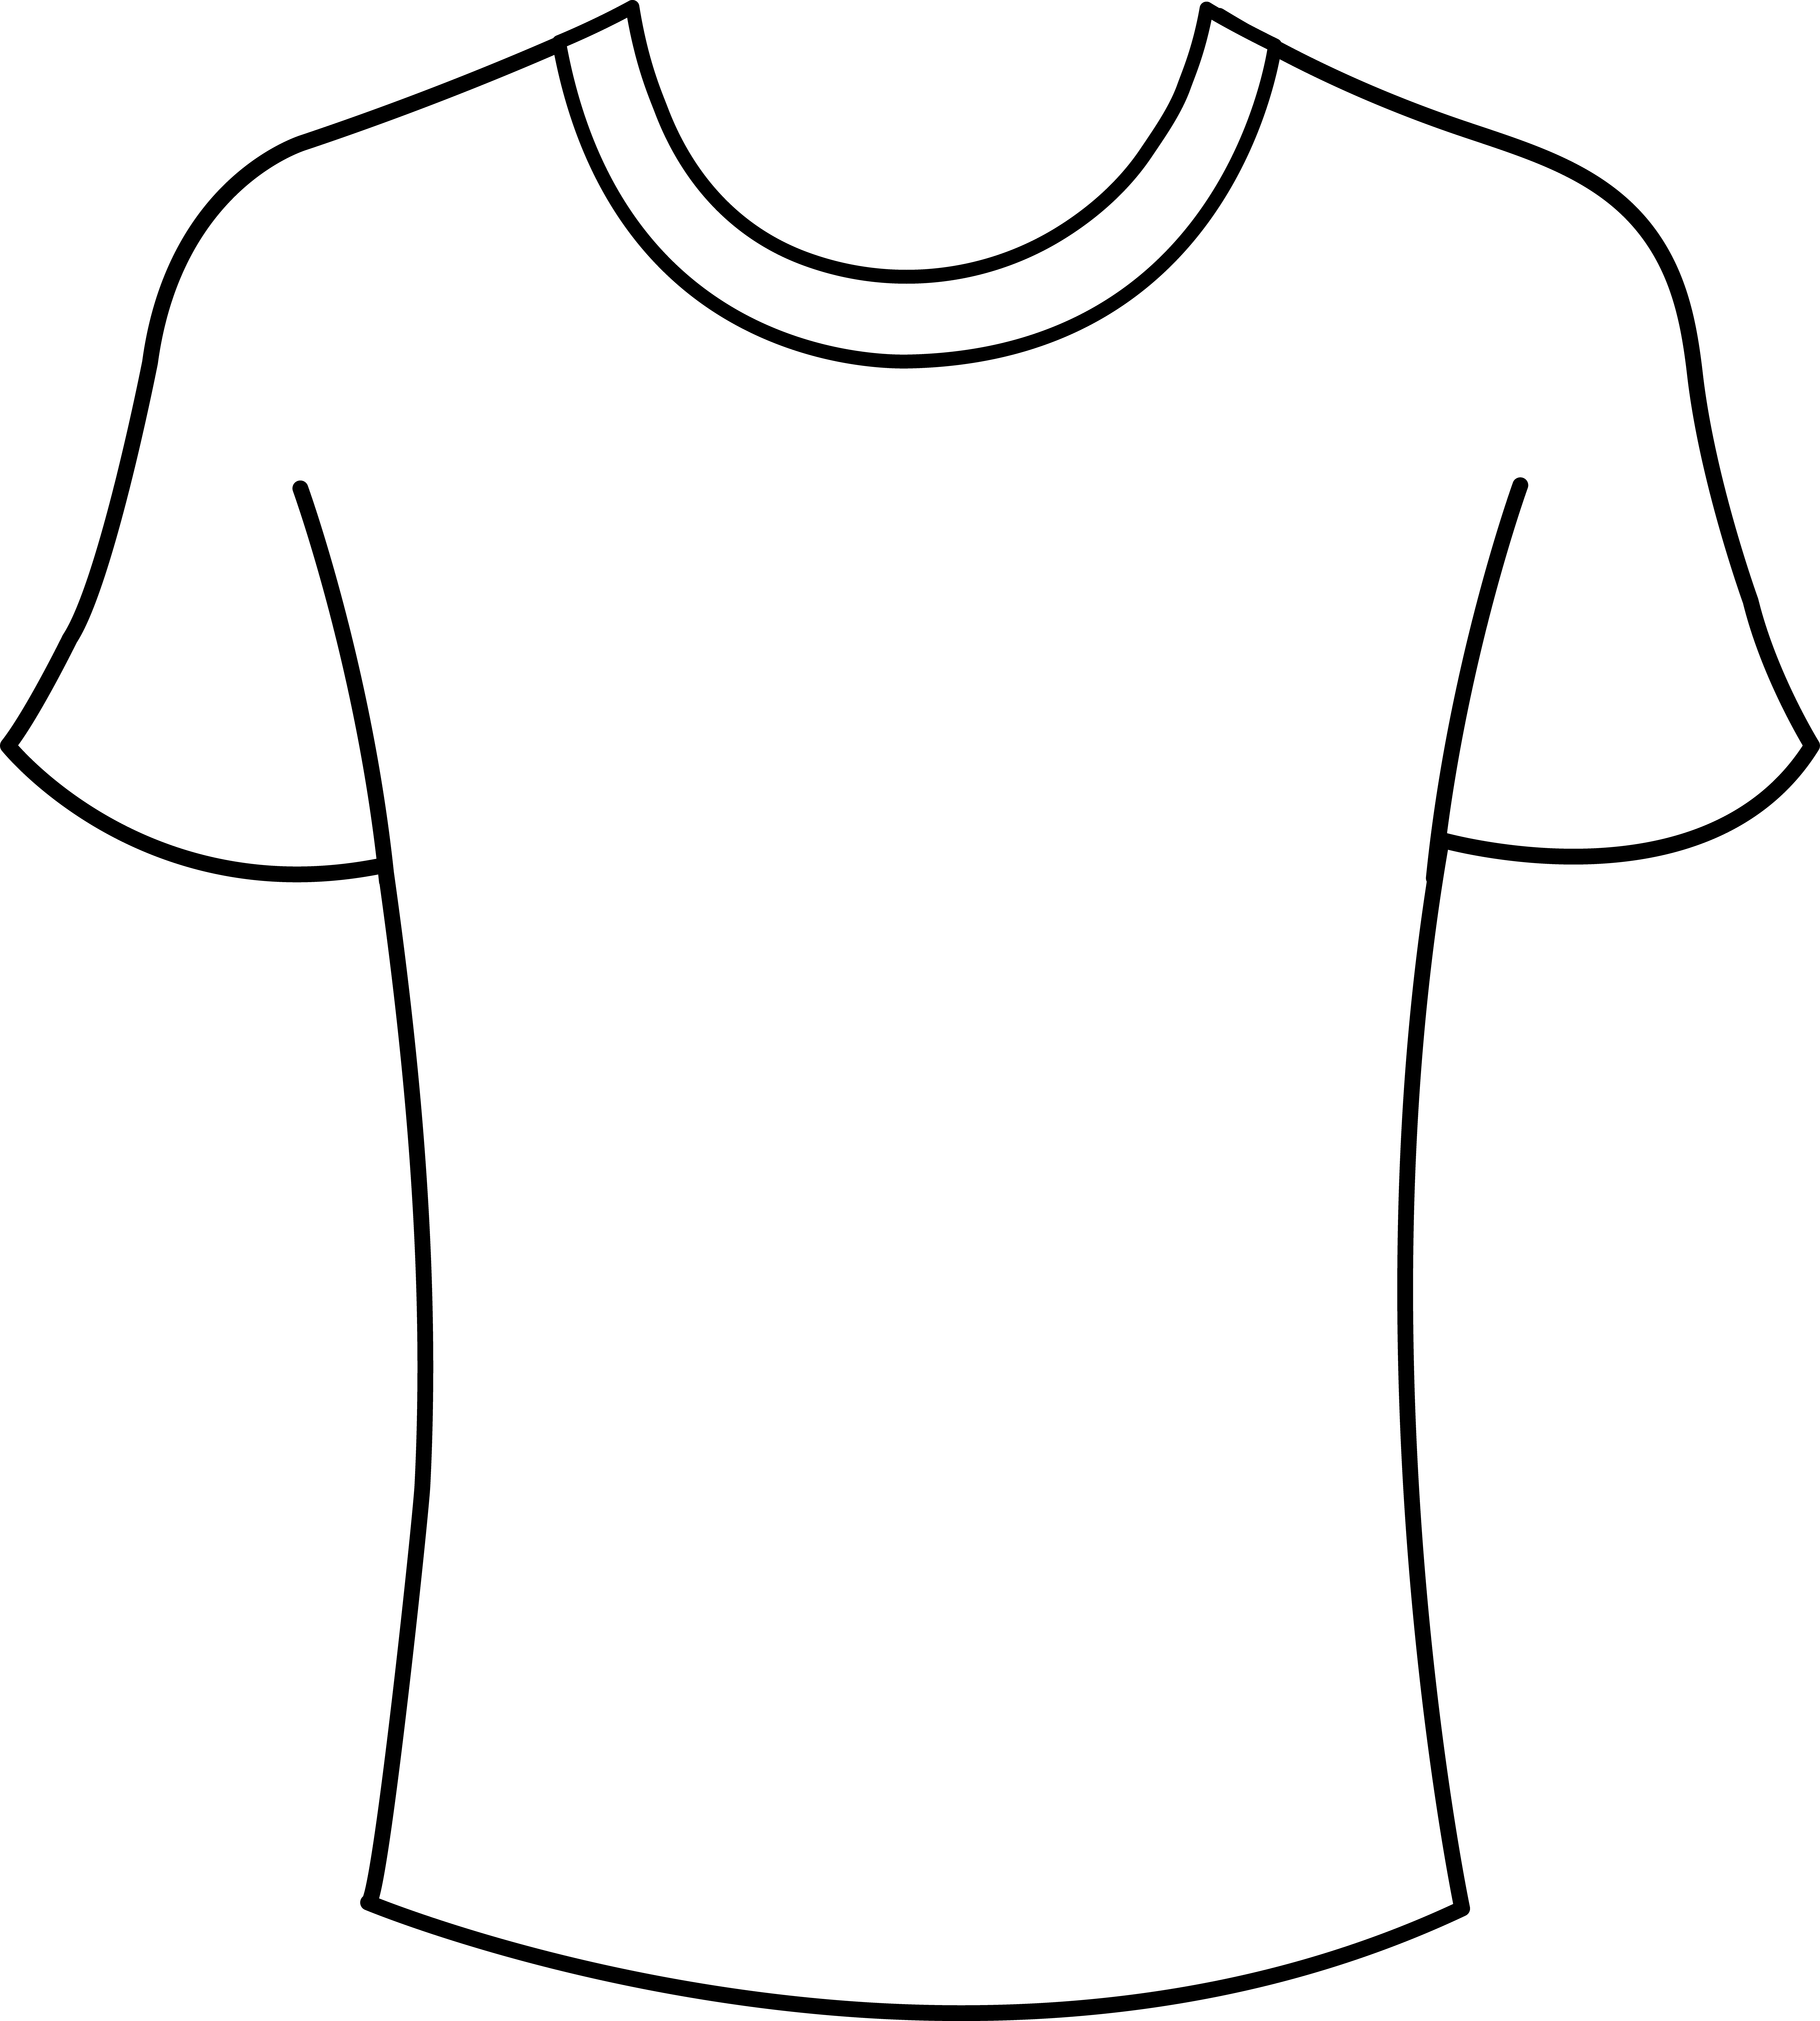 T shirt shirt outline clip art clipart clipart